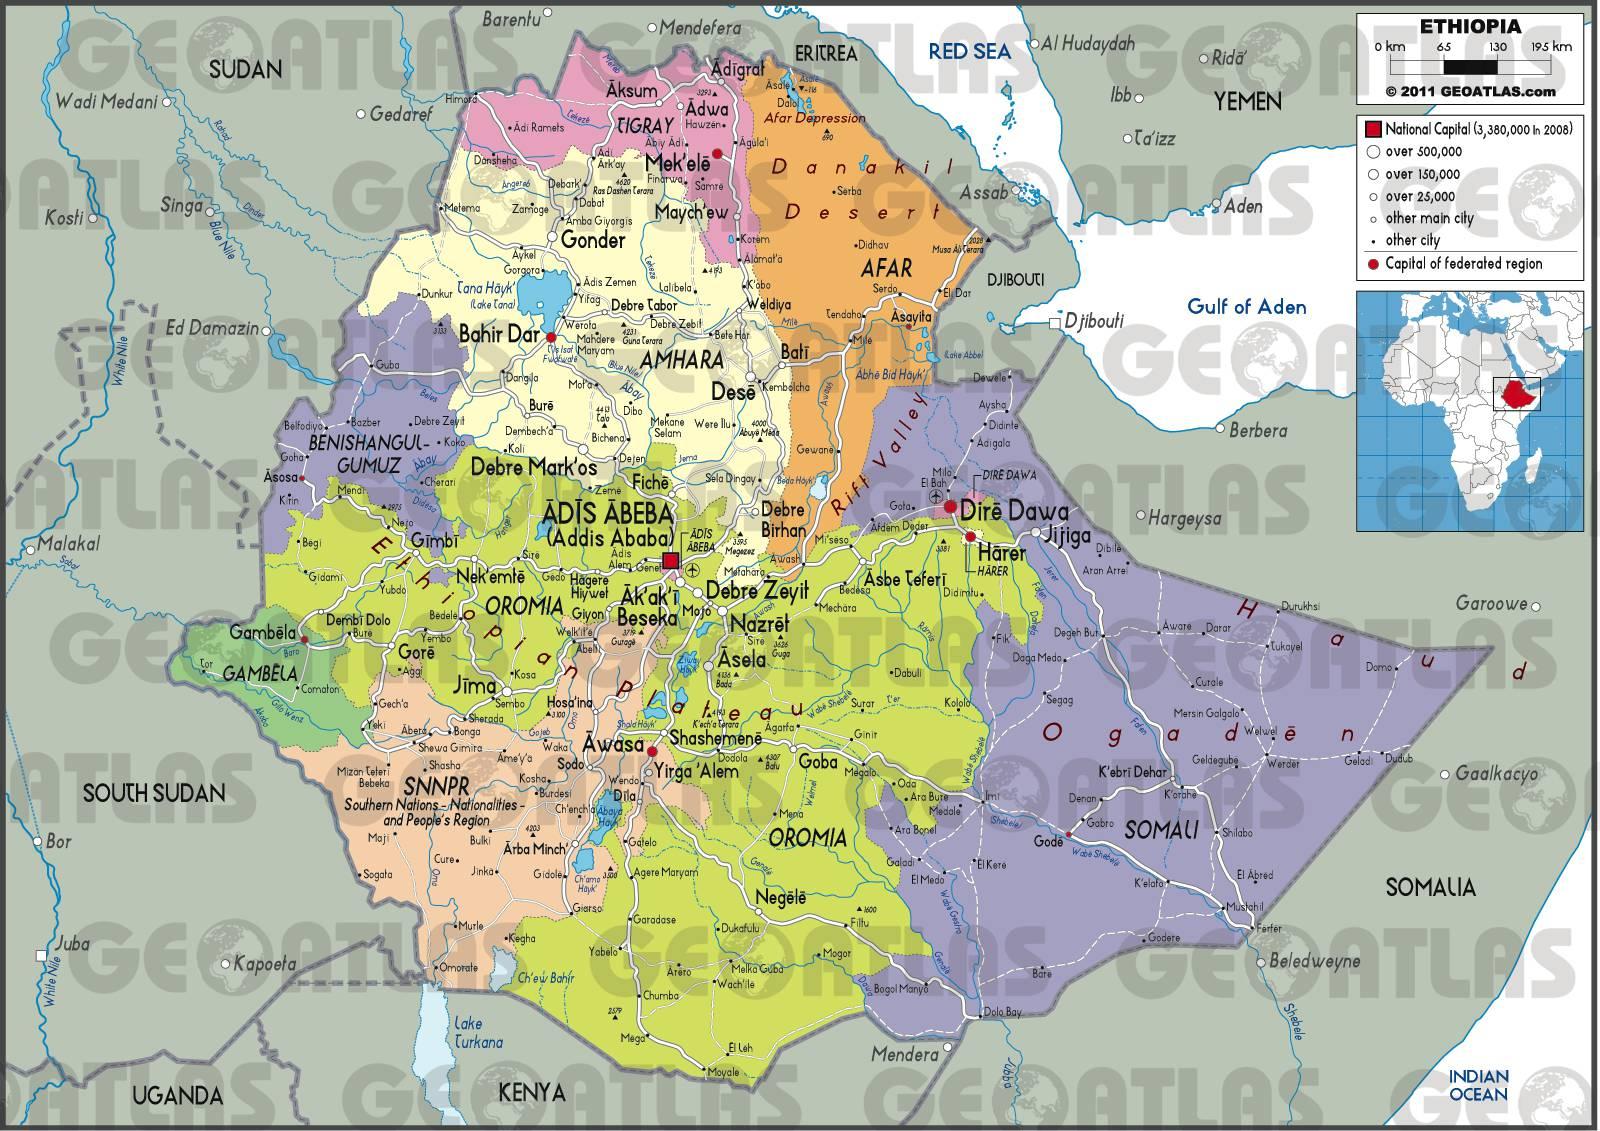 Carte administrative de l'Ethiopie